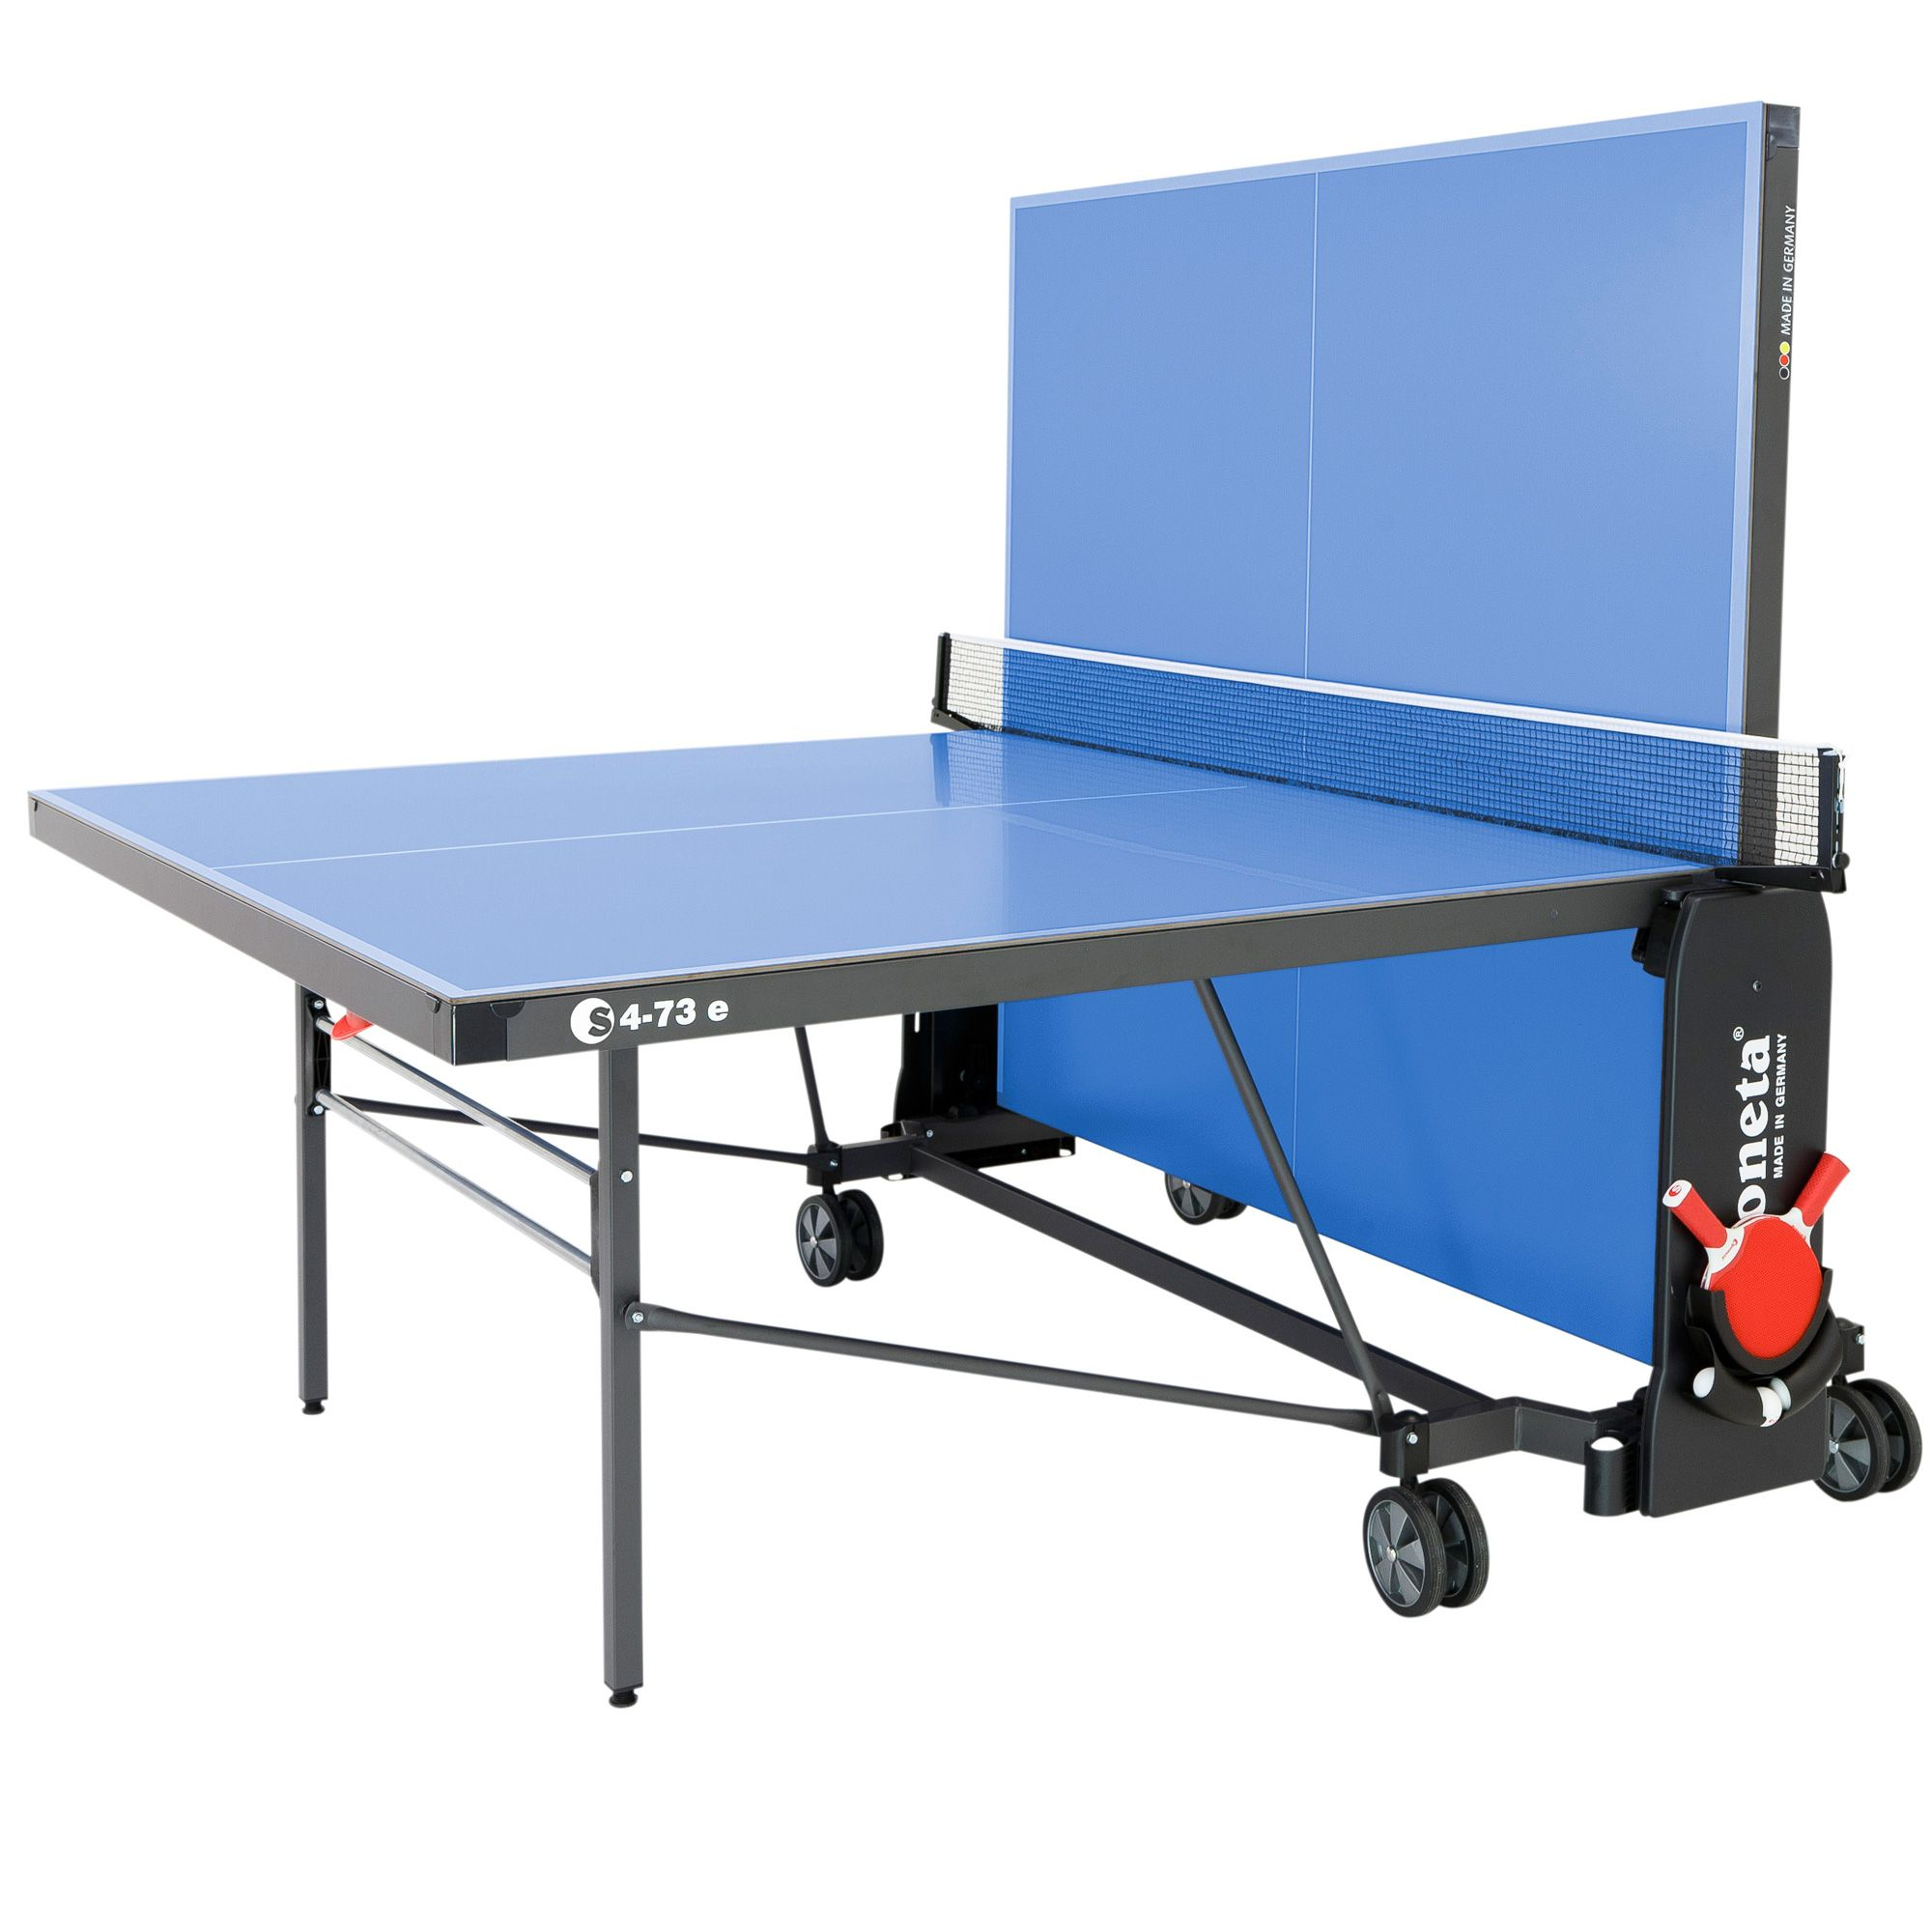 Sponeta expert outdoor table tennis table - Sponeta table tennis table ...